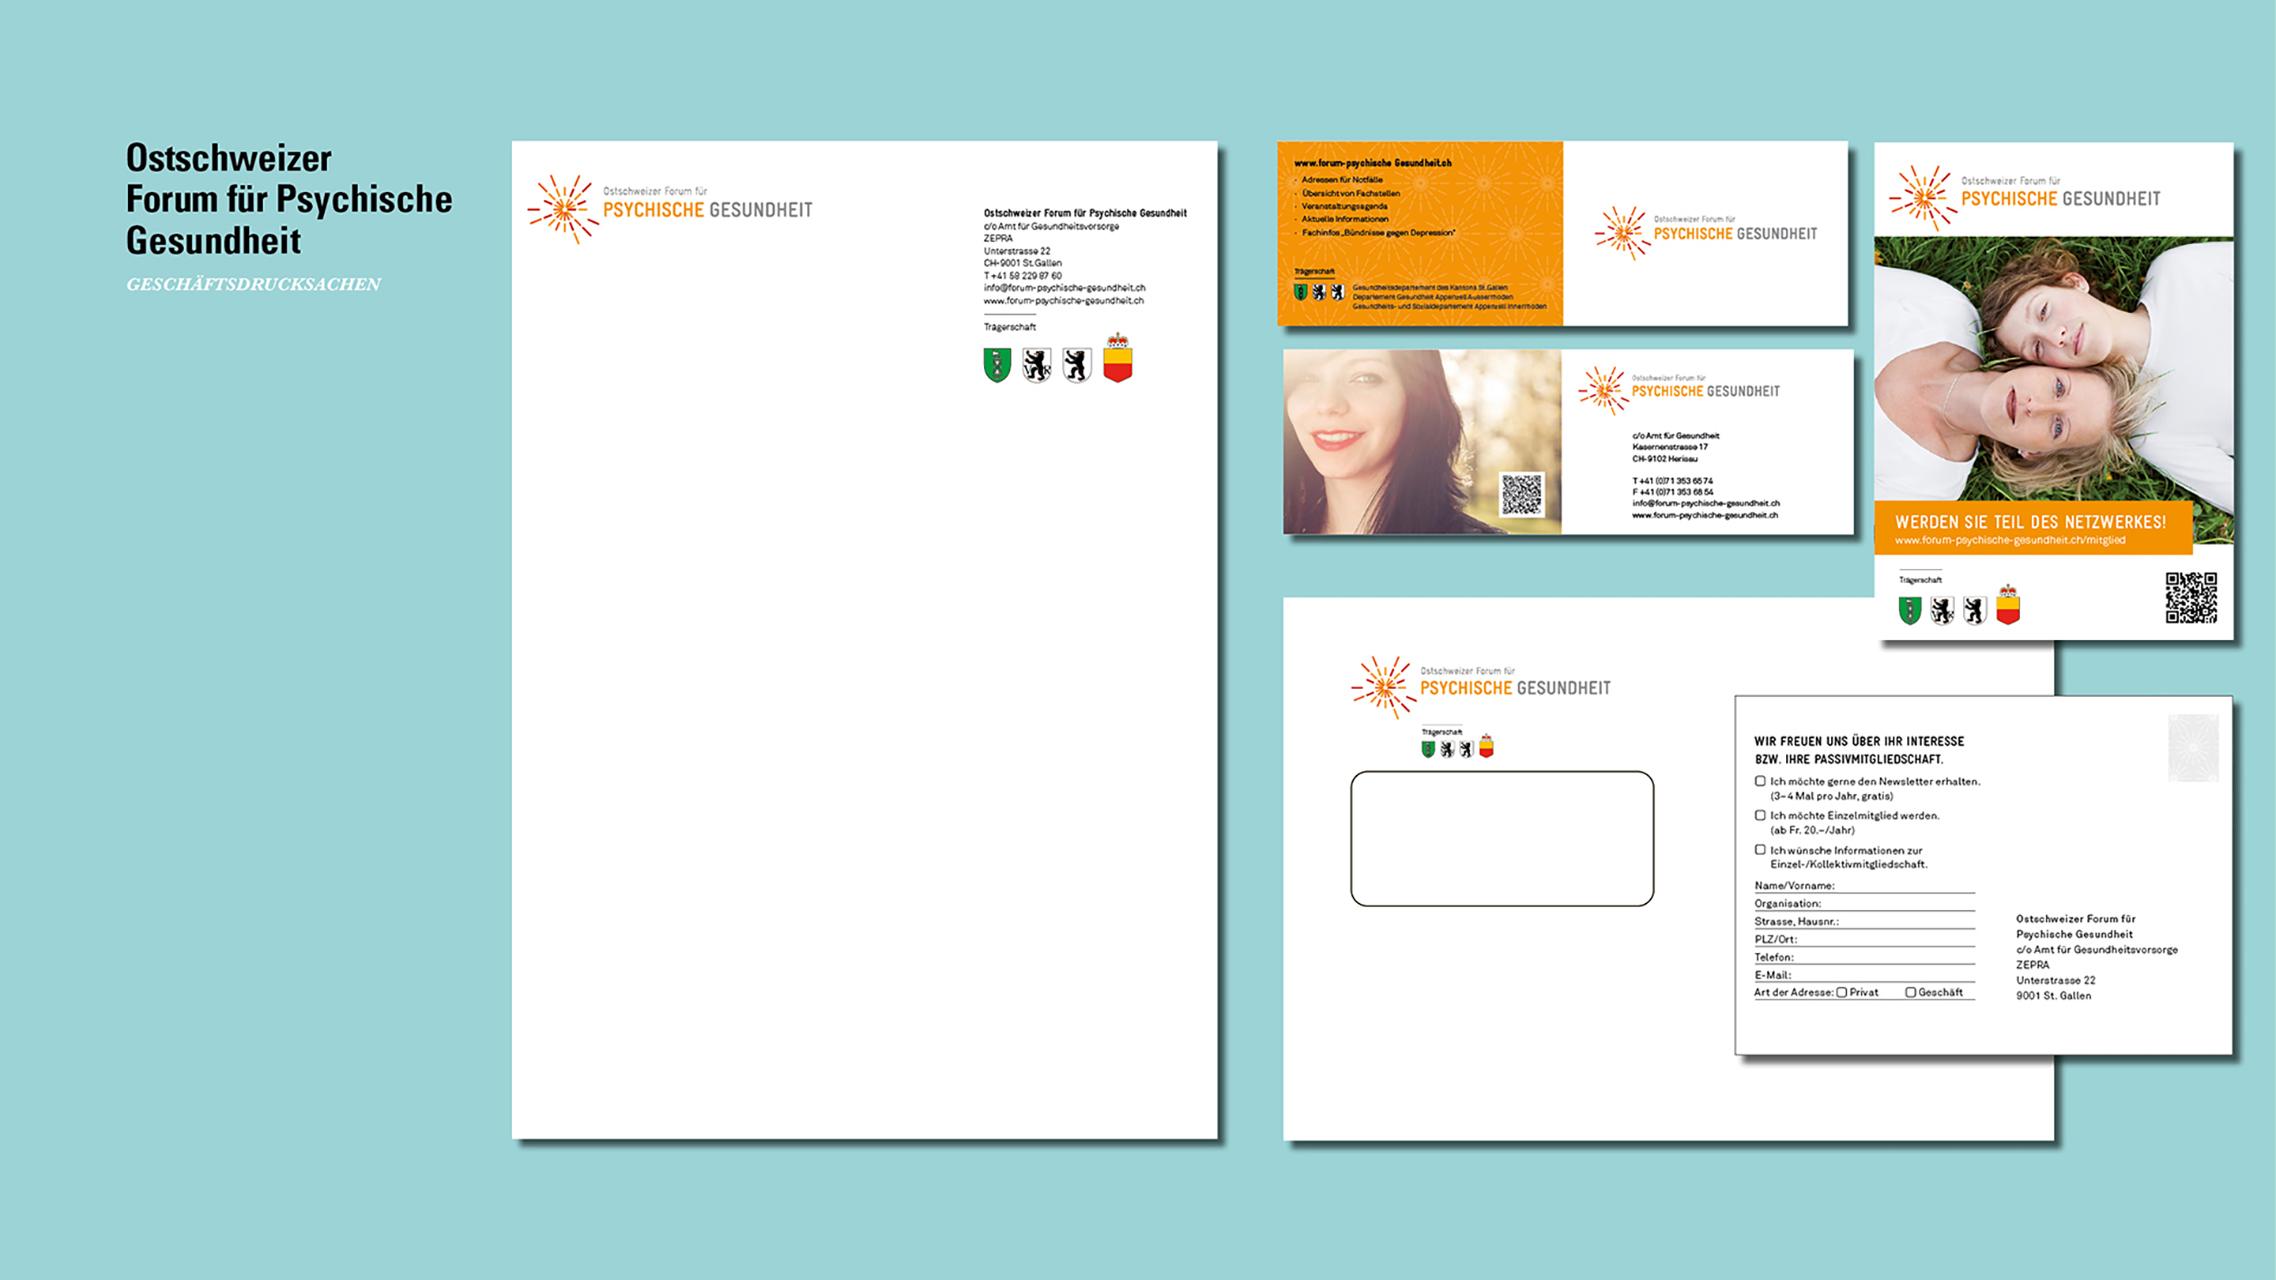 OFPG_Geschaeftsdrucksachen.jpg